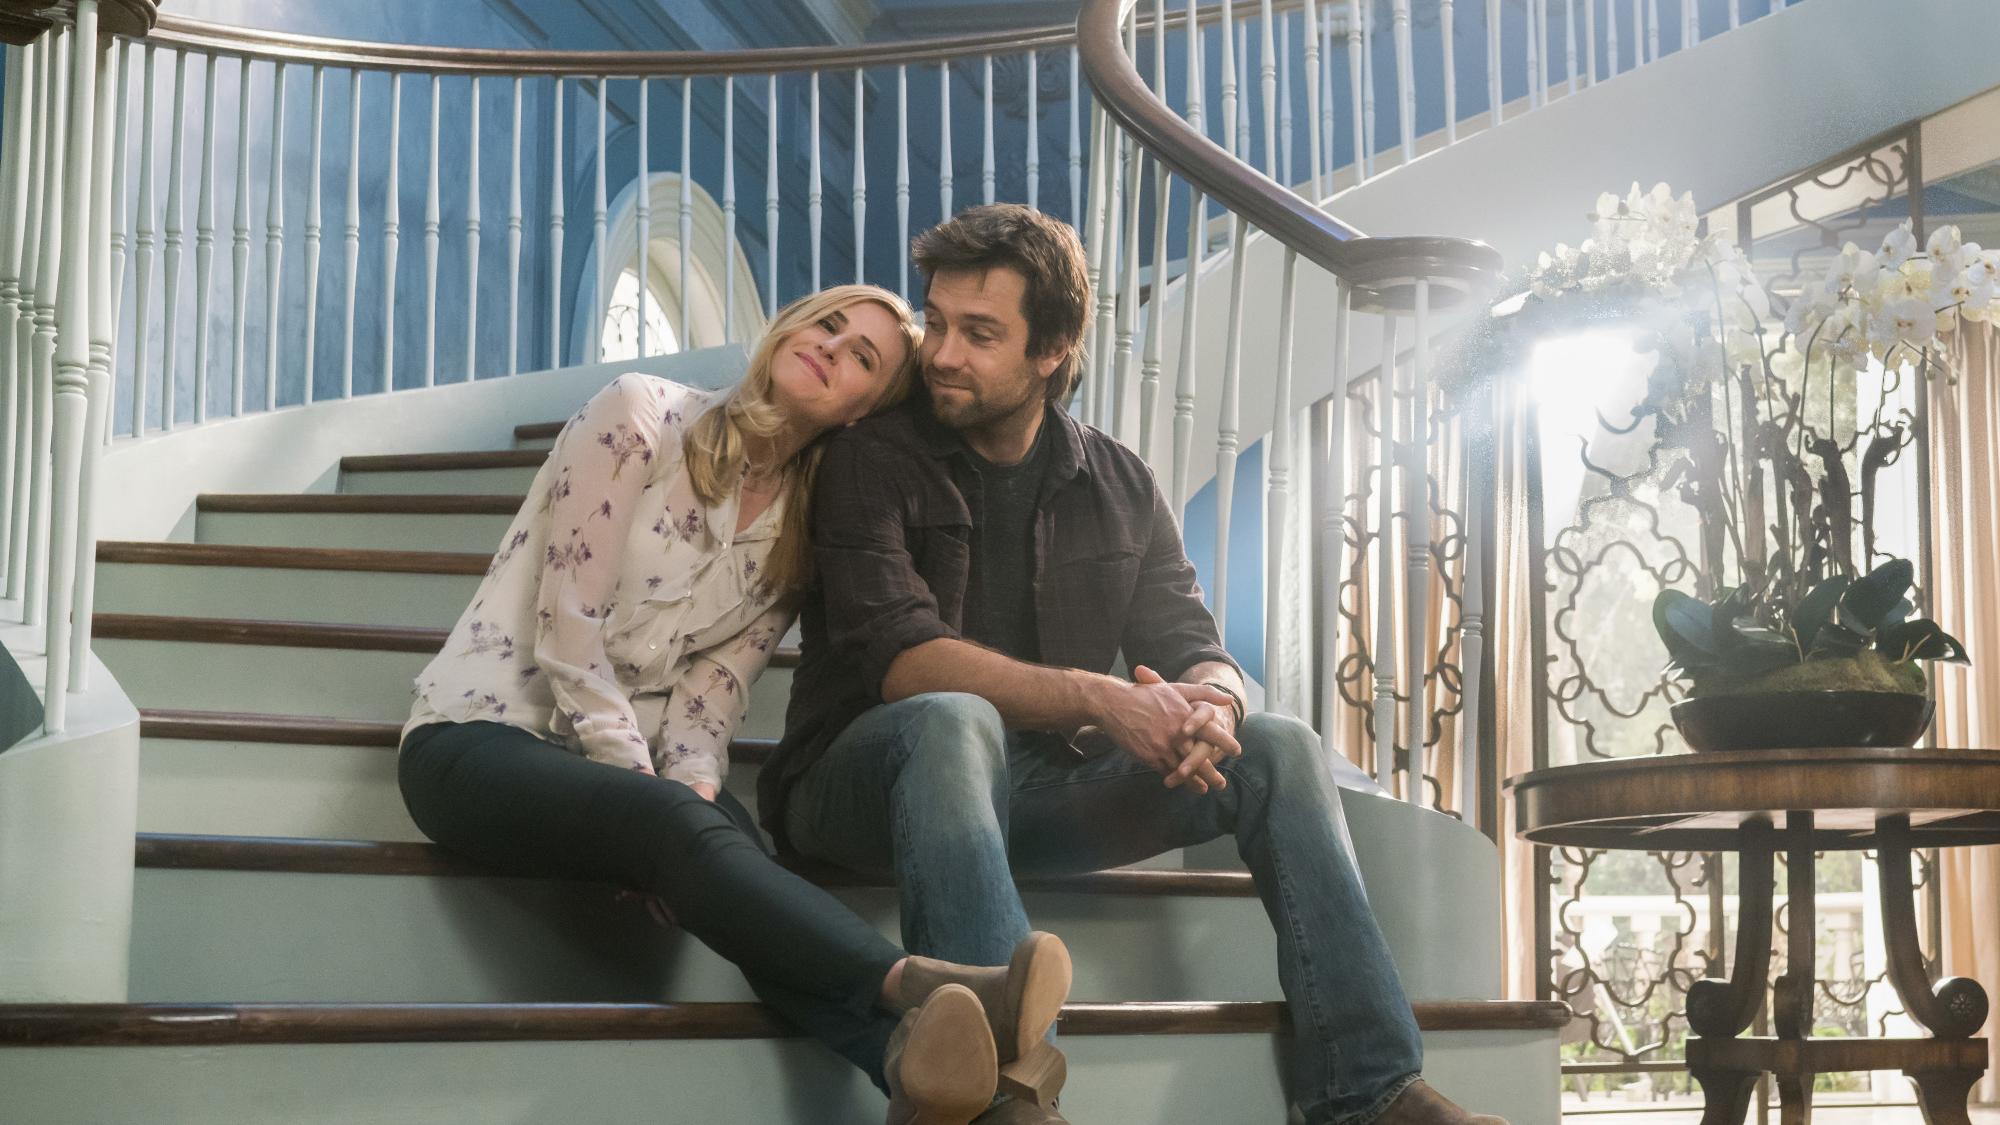 Tessa and Garrett bond on the steps of the Hawthorne steps.